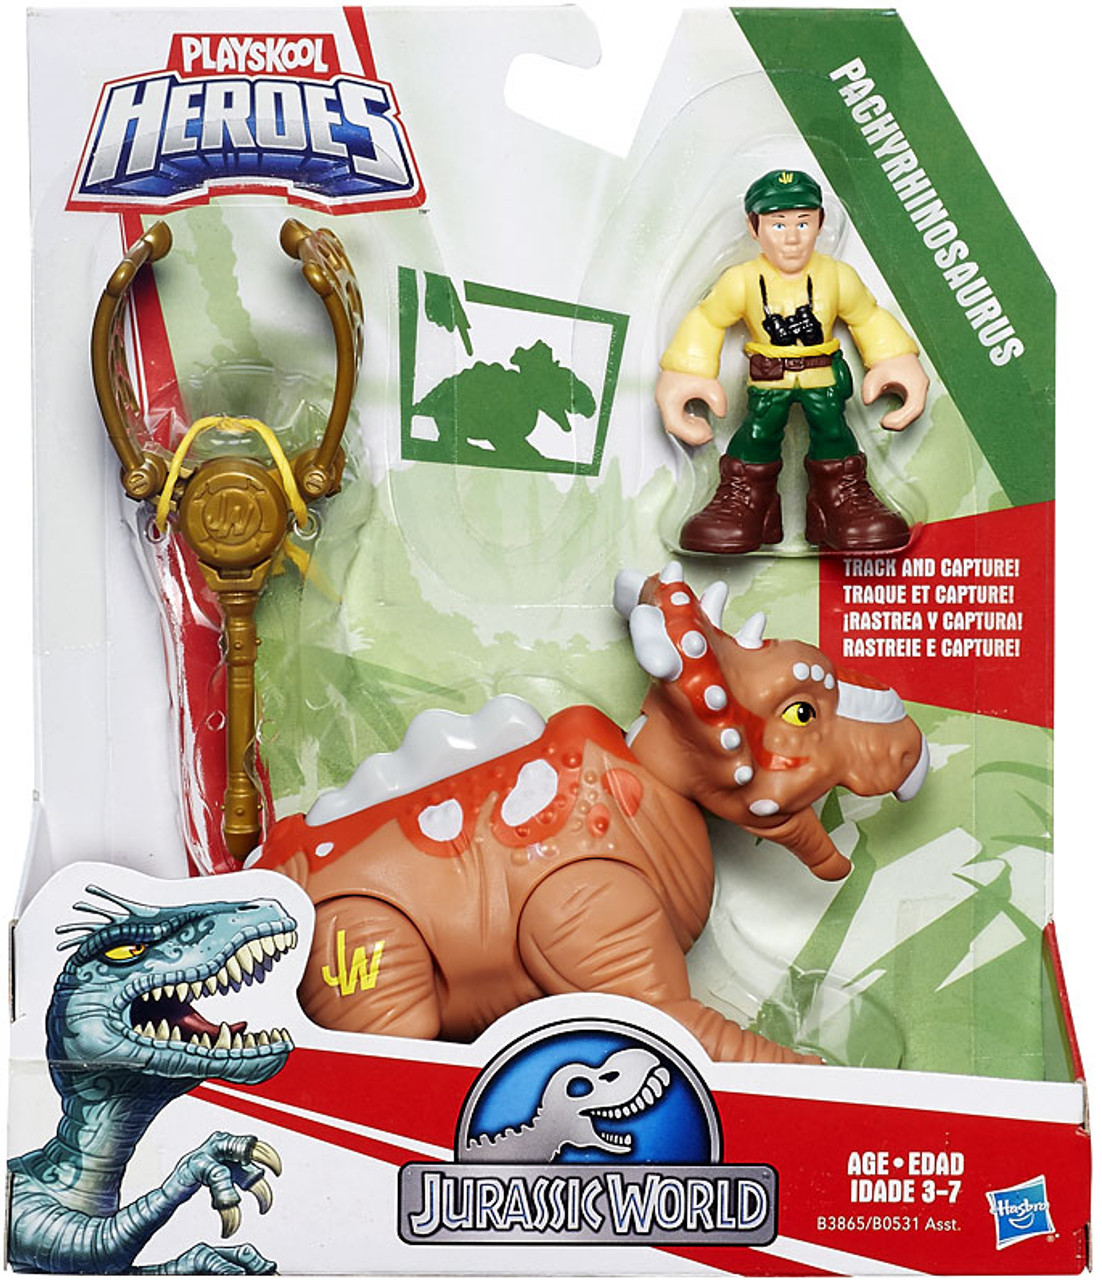 Playskool Heroes Juric World T Rex Figure 3